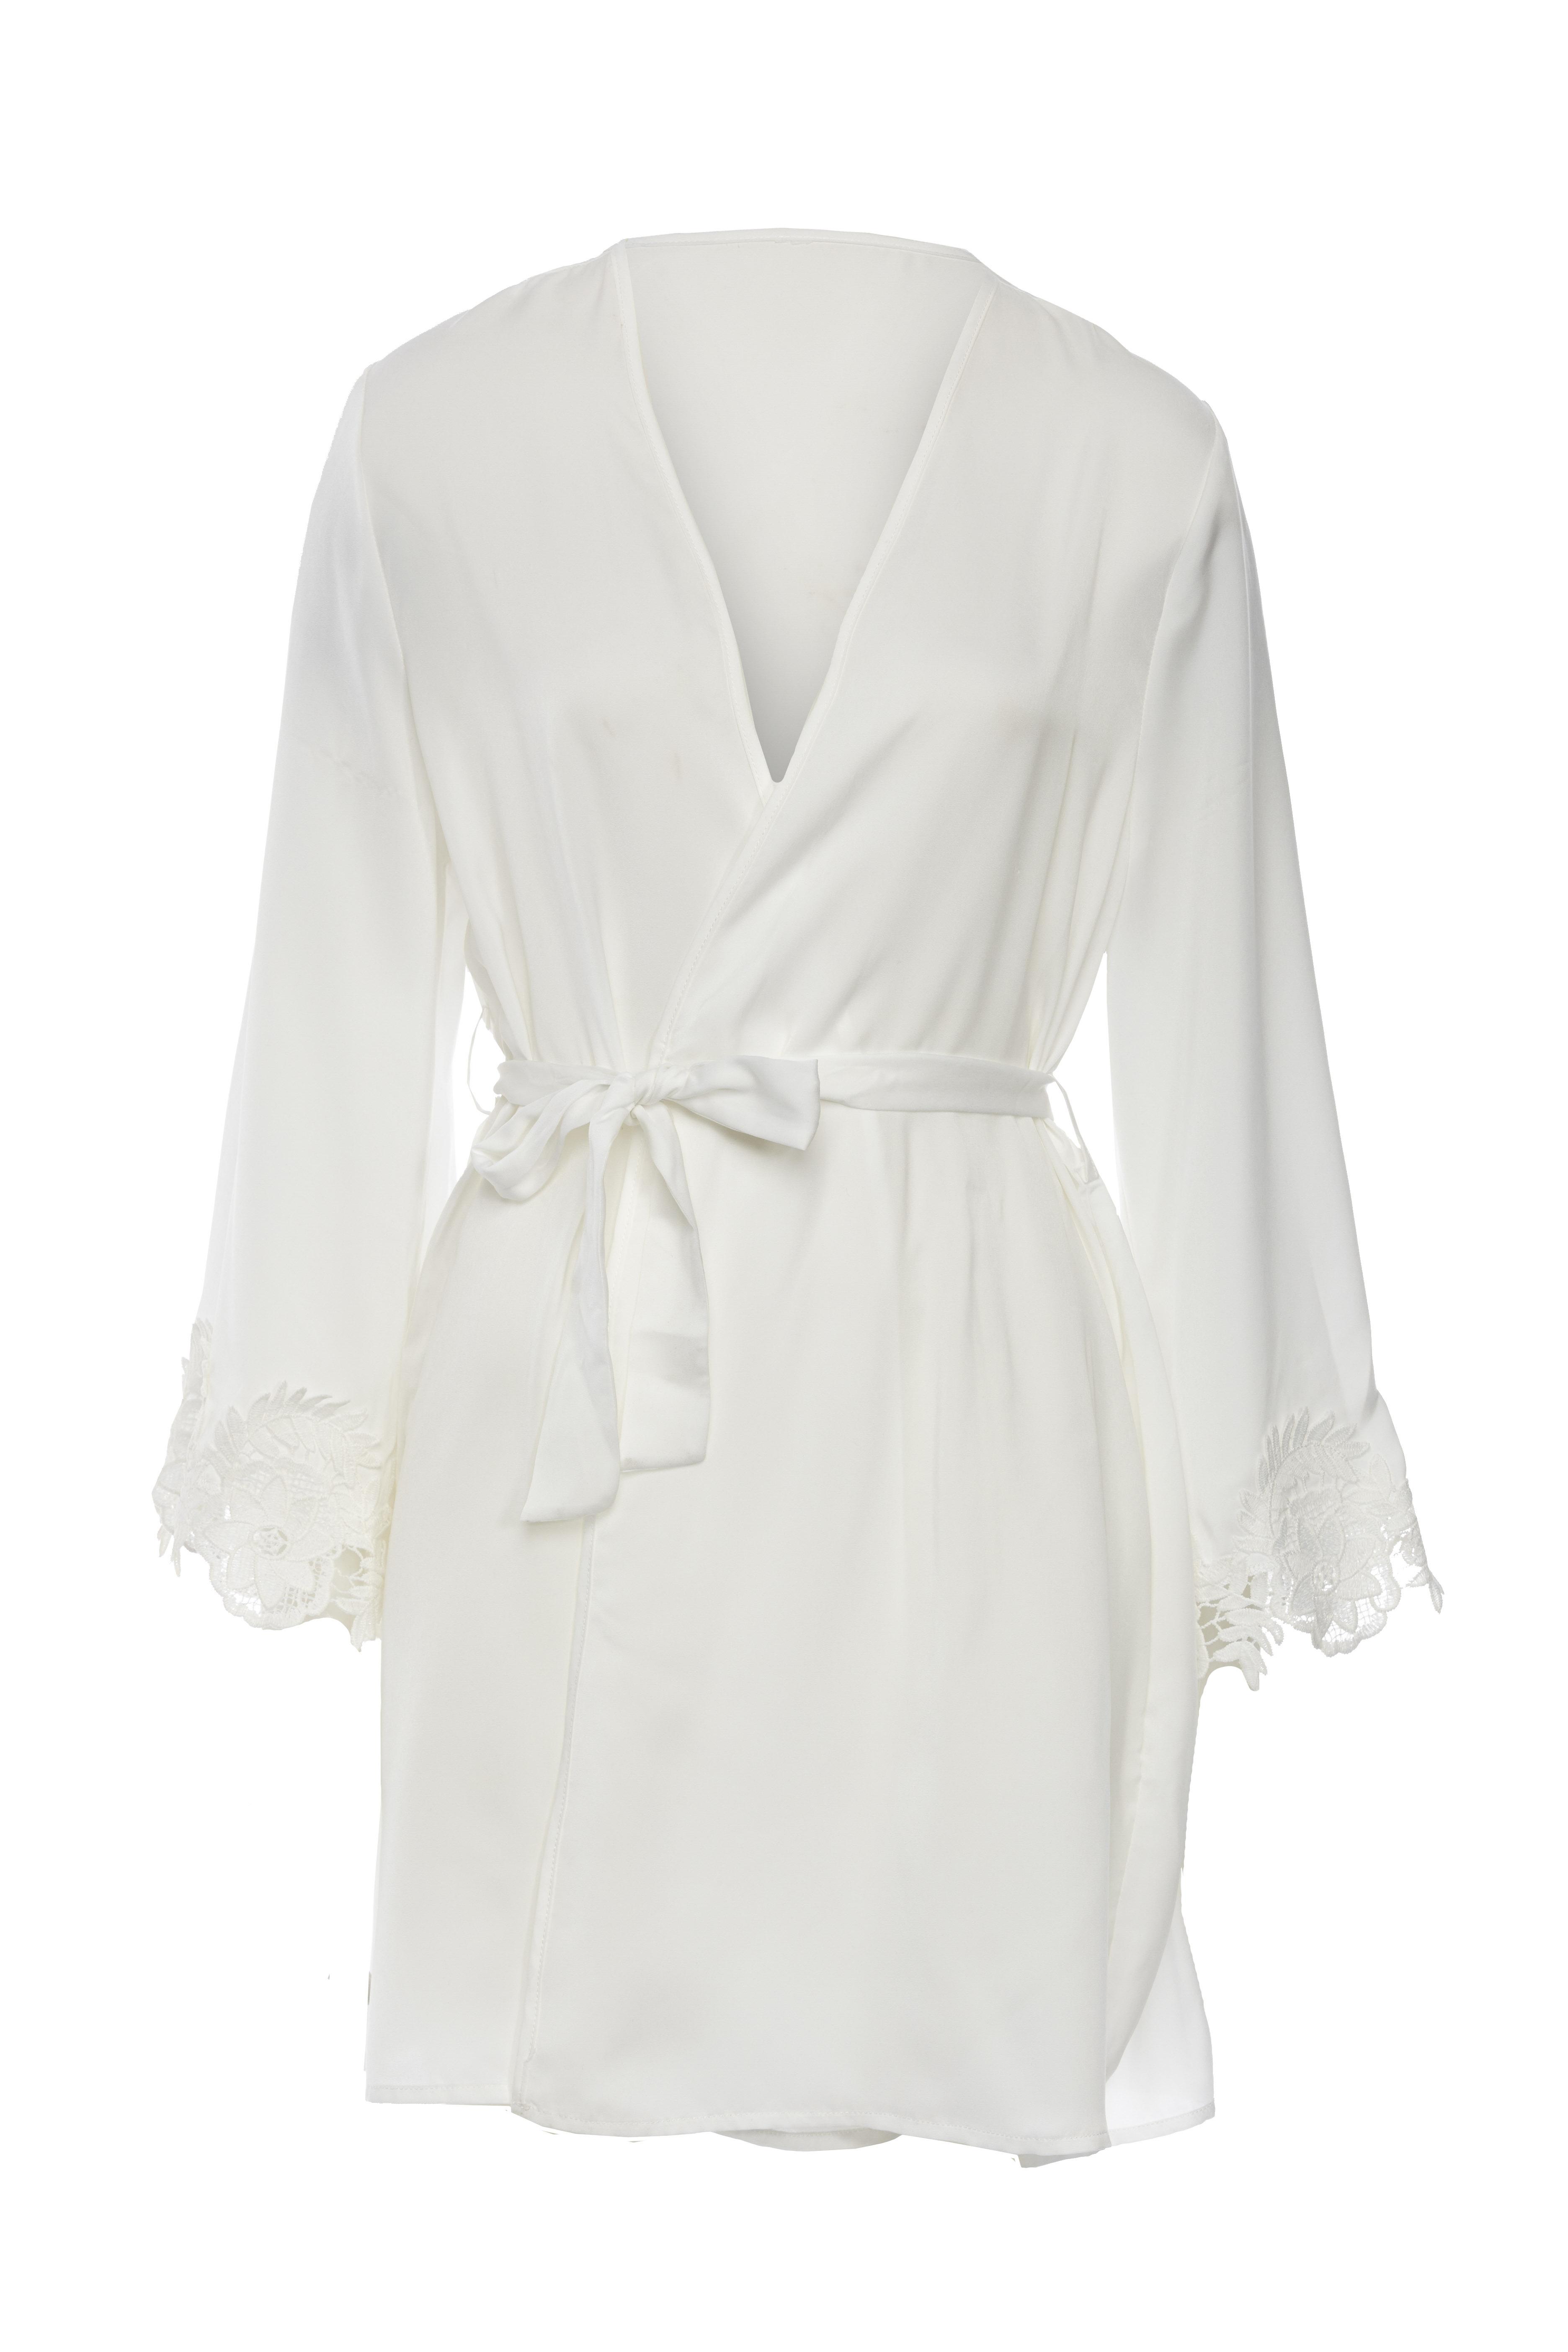 cotton-on-body_talia-gown_nz39-95_sept-oct-nov-dec